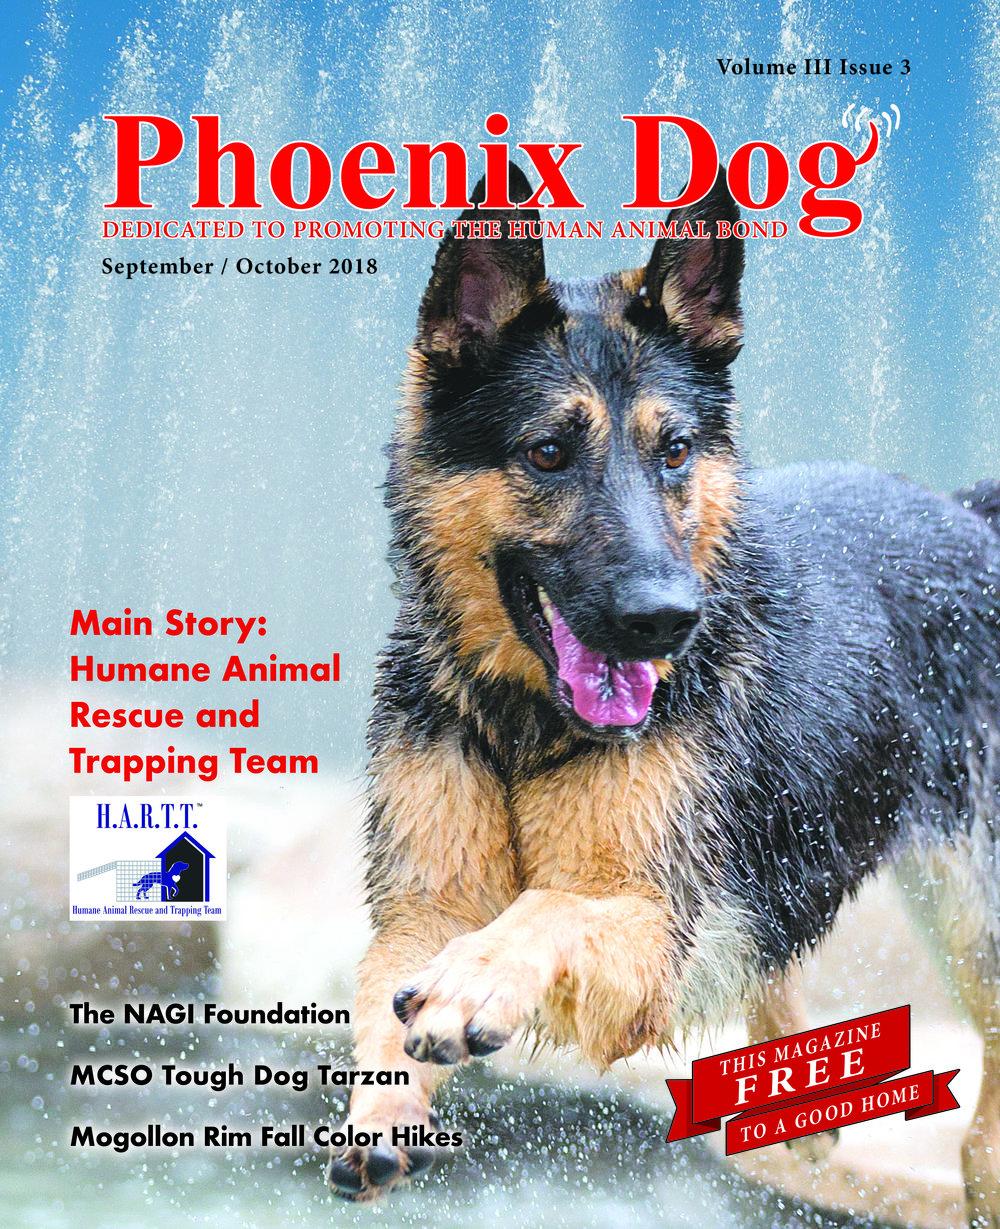 Phoenix_Dog_Magazine_Sept_Cover